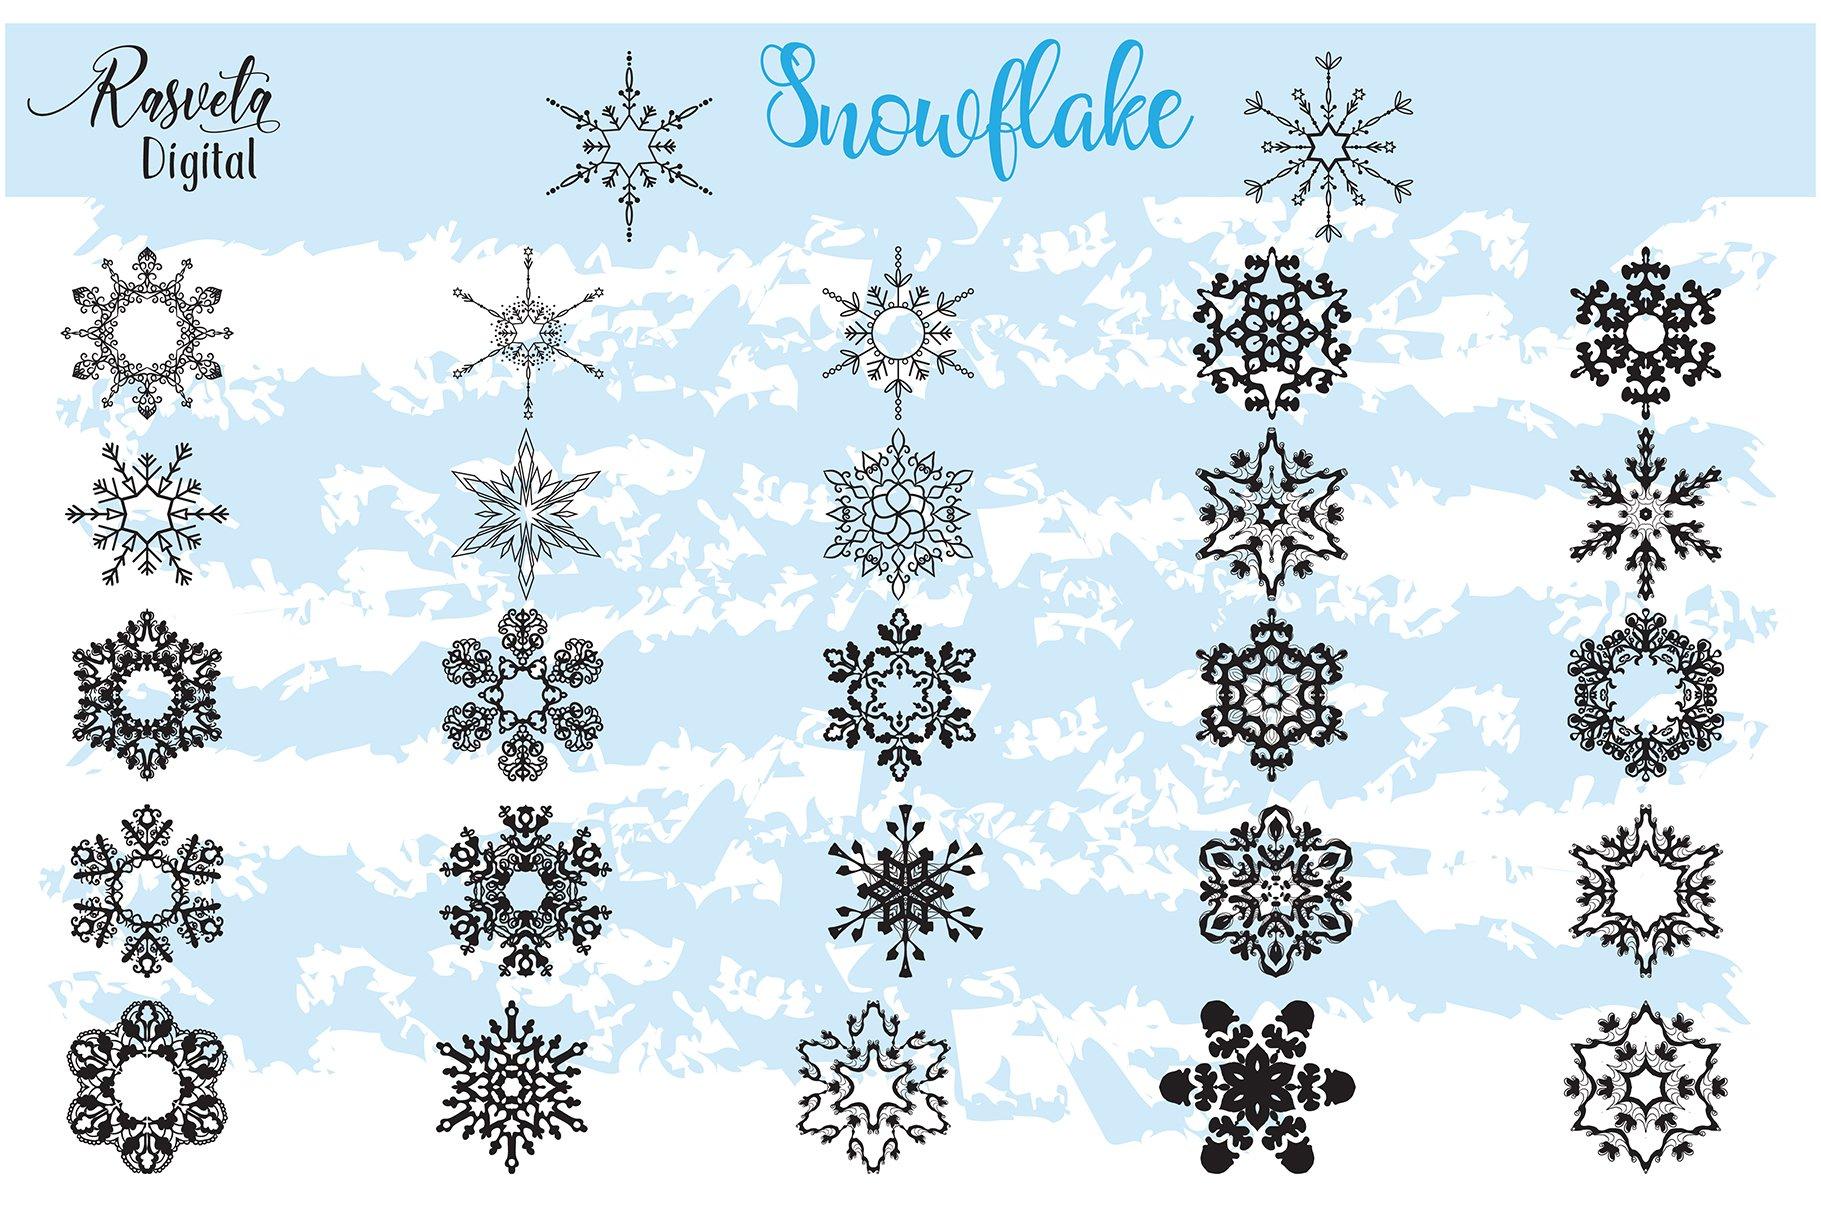 Christmas Decor Snowflake Clipart Snowflake Silhouette 168924 Illustrations Design Bundles Snowflakes silhouette snowflake vectors (29,848). christmas decor snowflake clipart snowflake silhouette